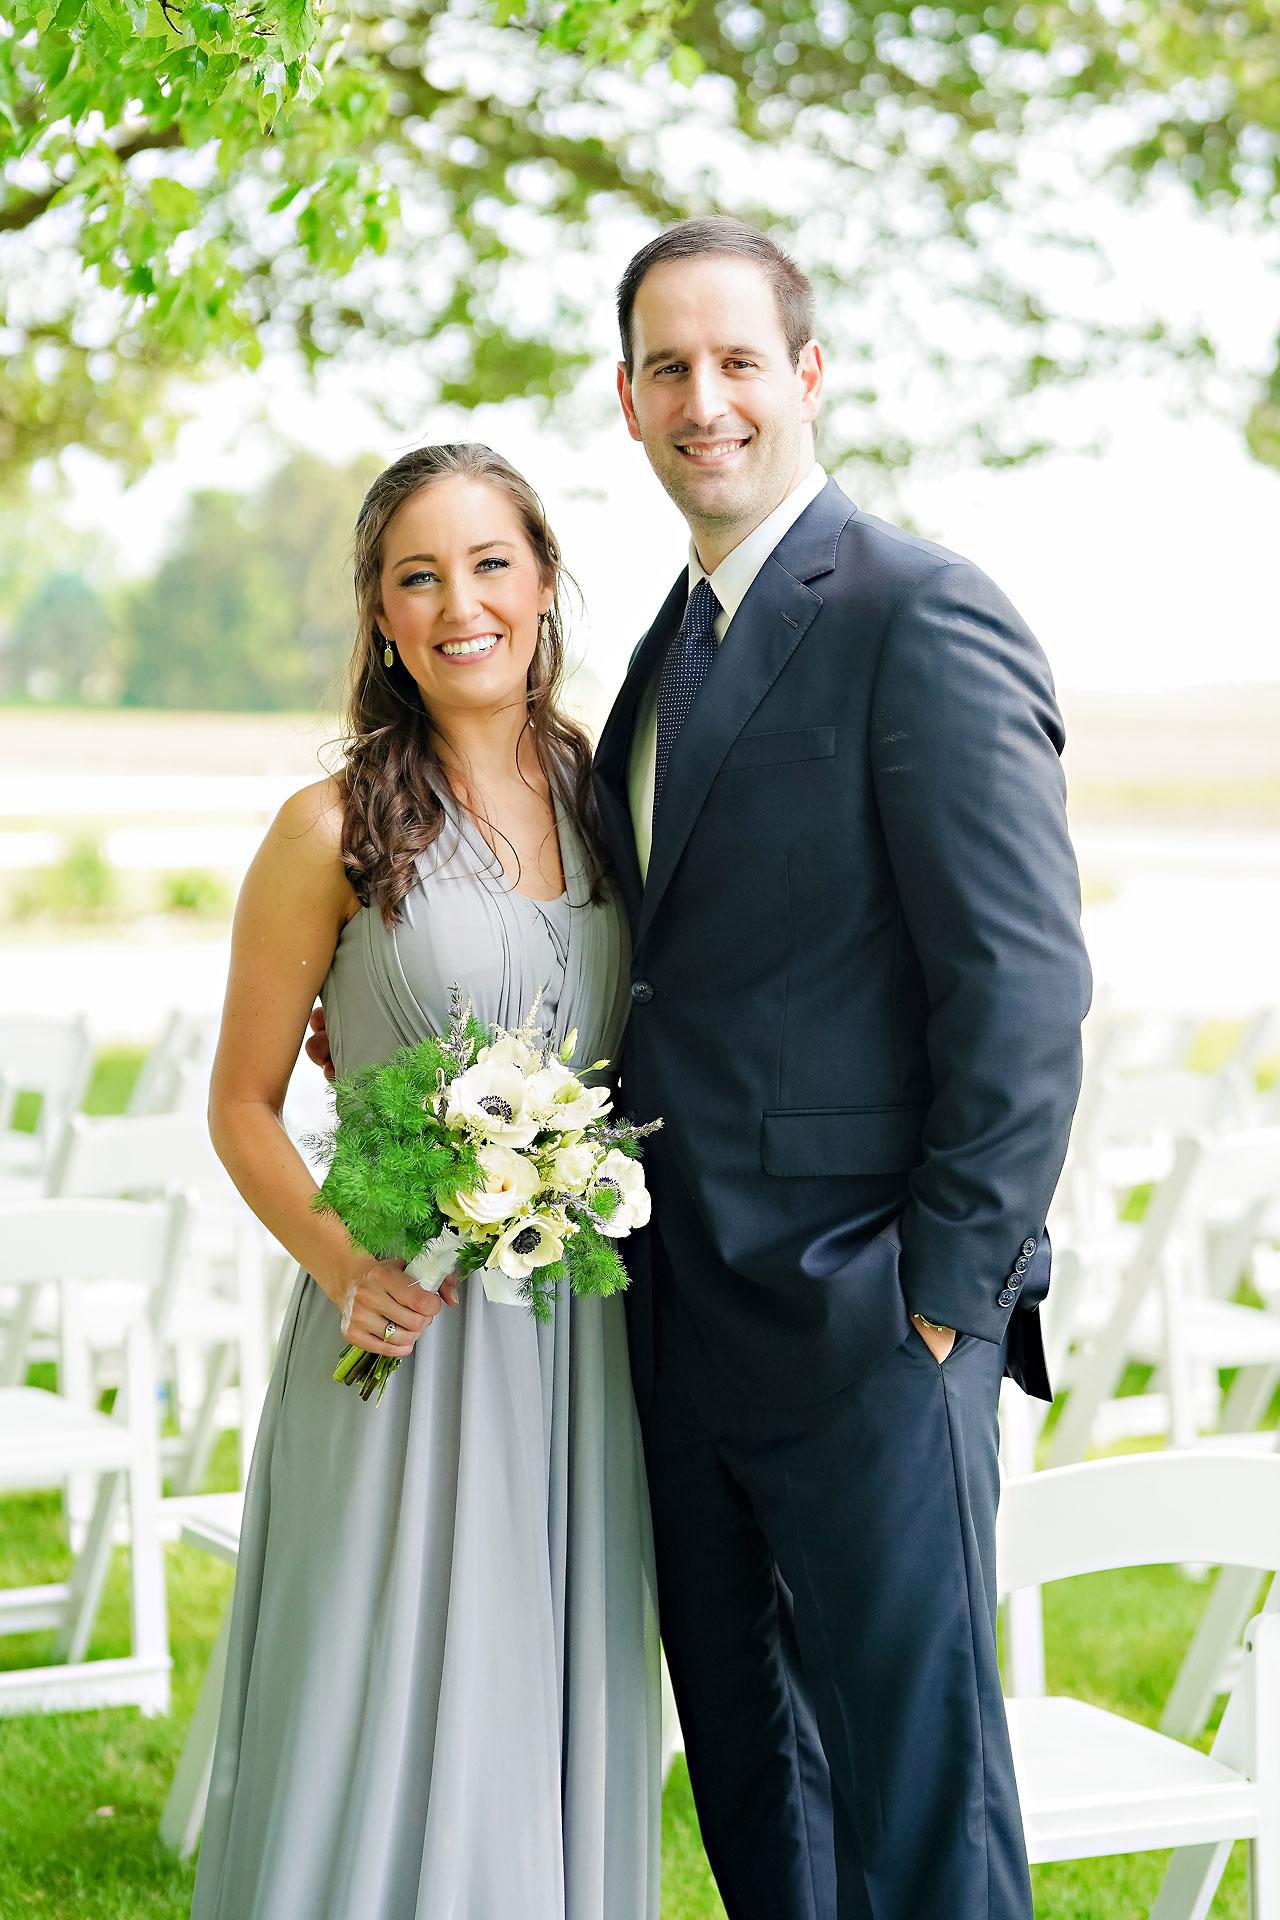 MacKinze John Lafayette Indiana Purdue Wedding 184